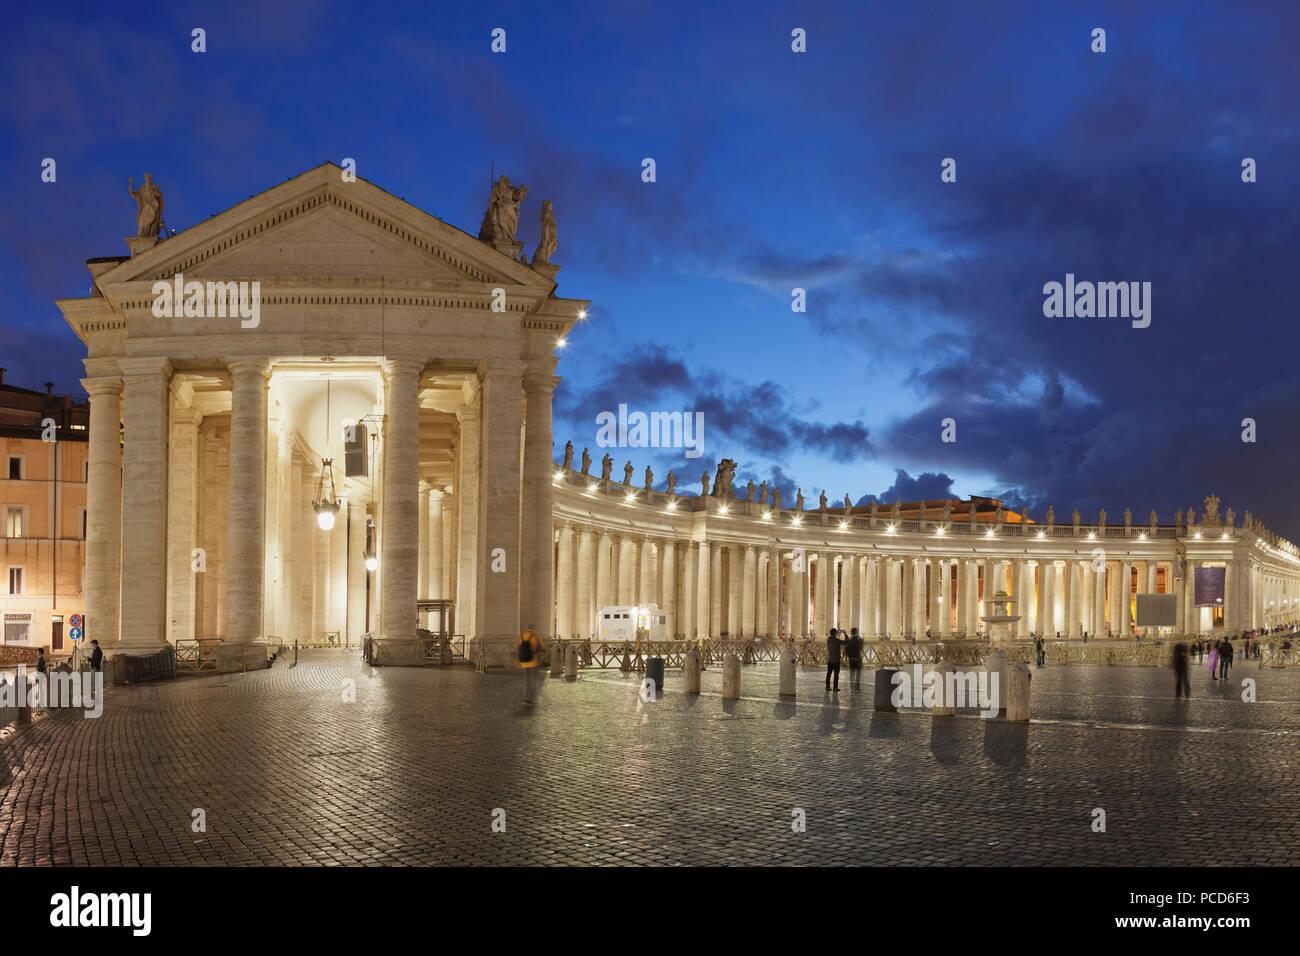 St. Peter's Square, Colonnade of Bernini, UNESCO World Heritage Site, Vatican City, Rome, Lazio, Italy, Europe Stock Photo